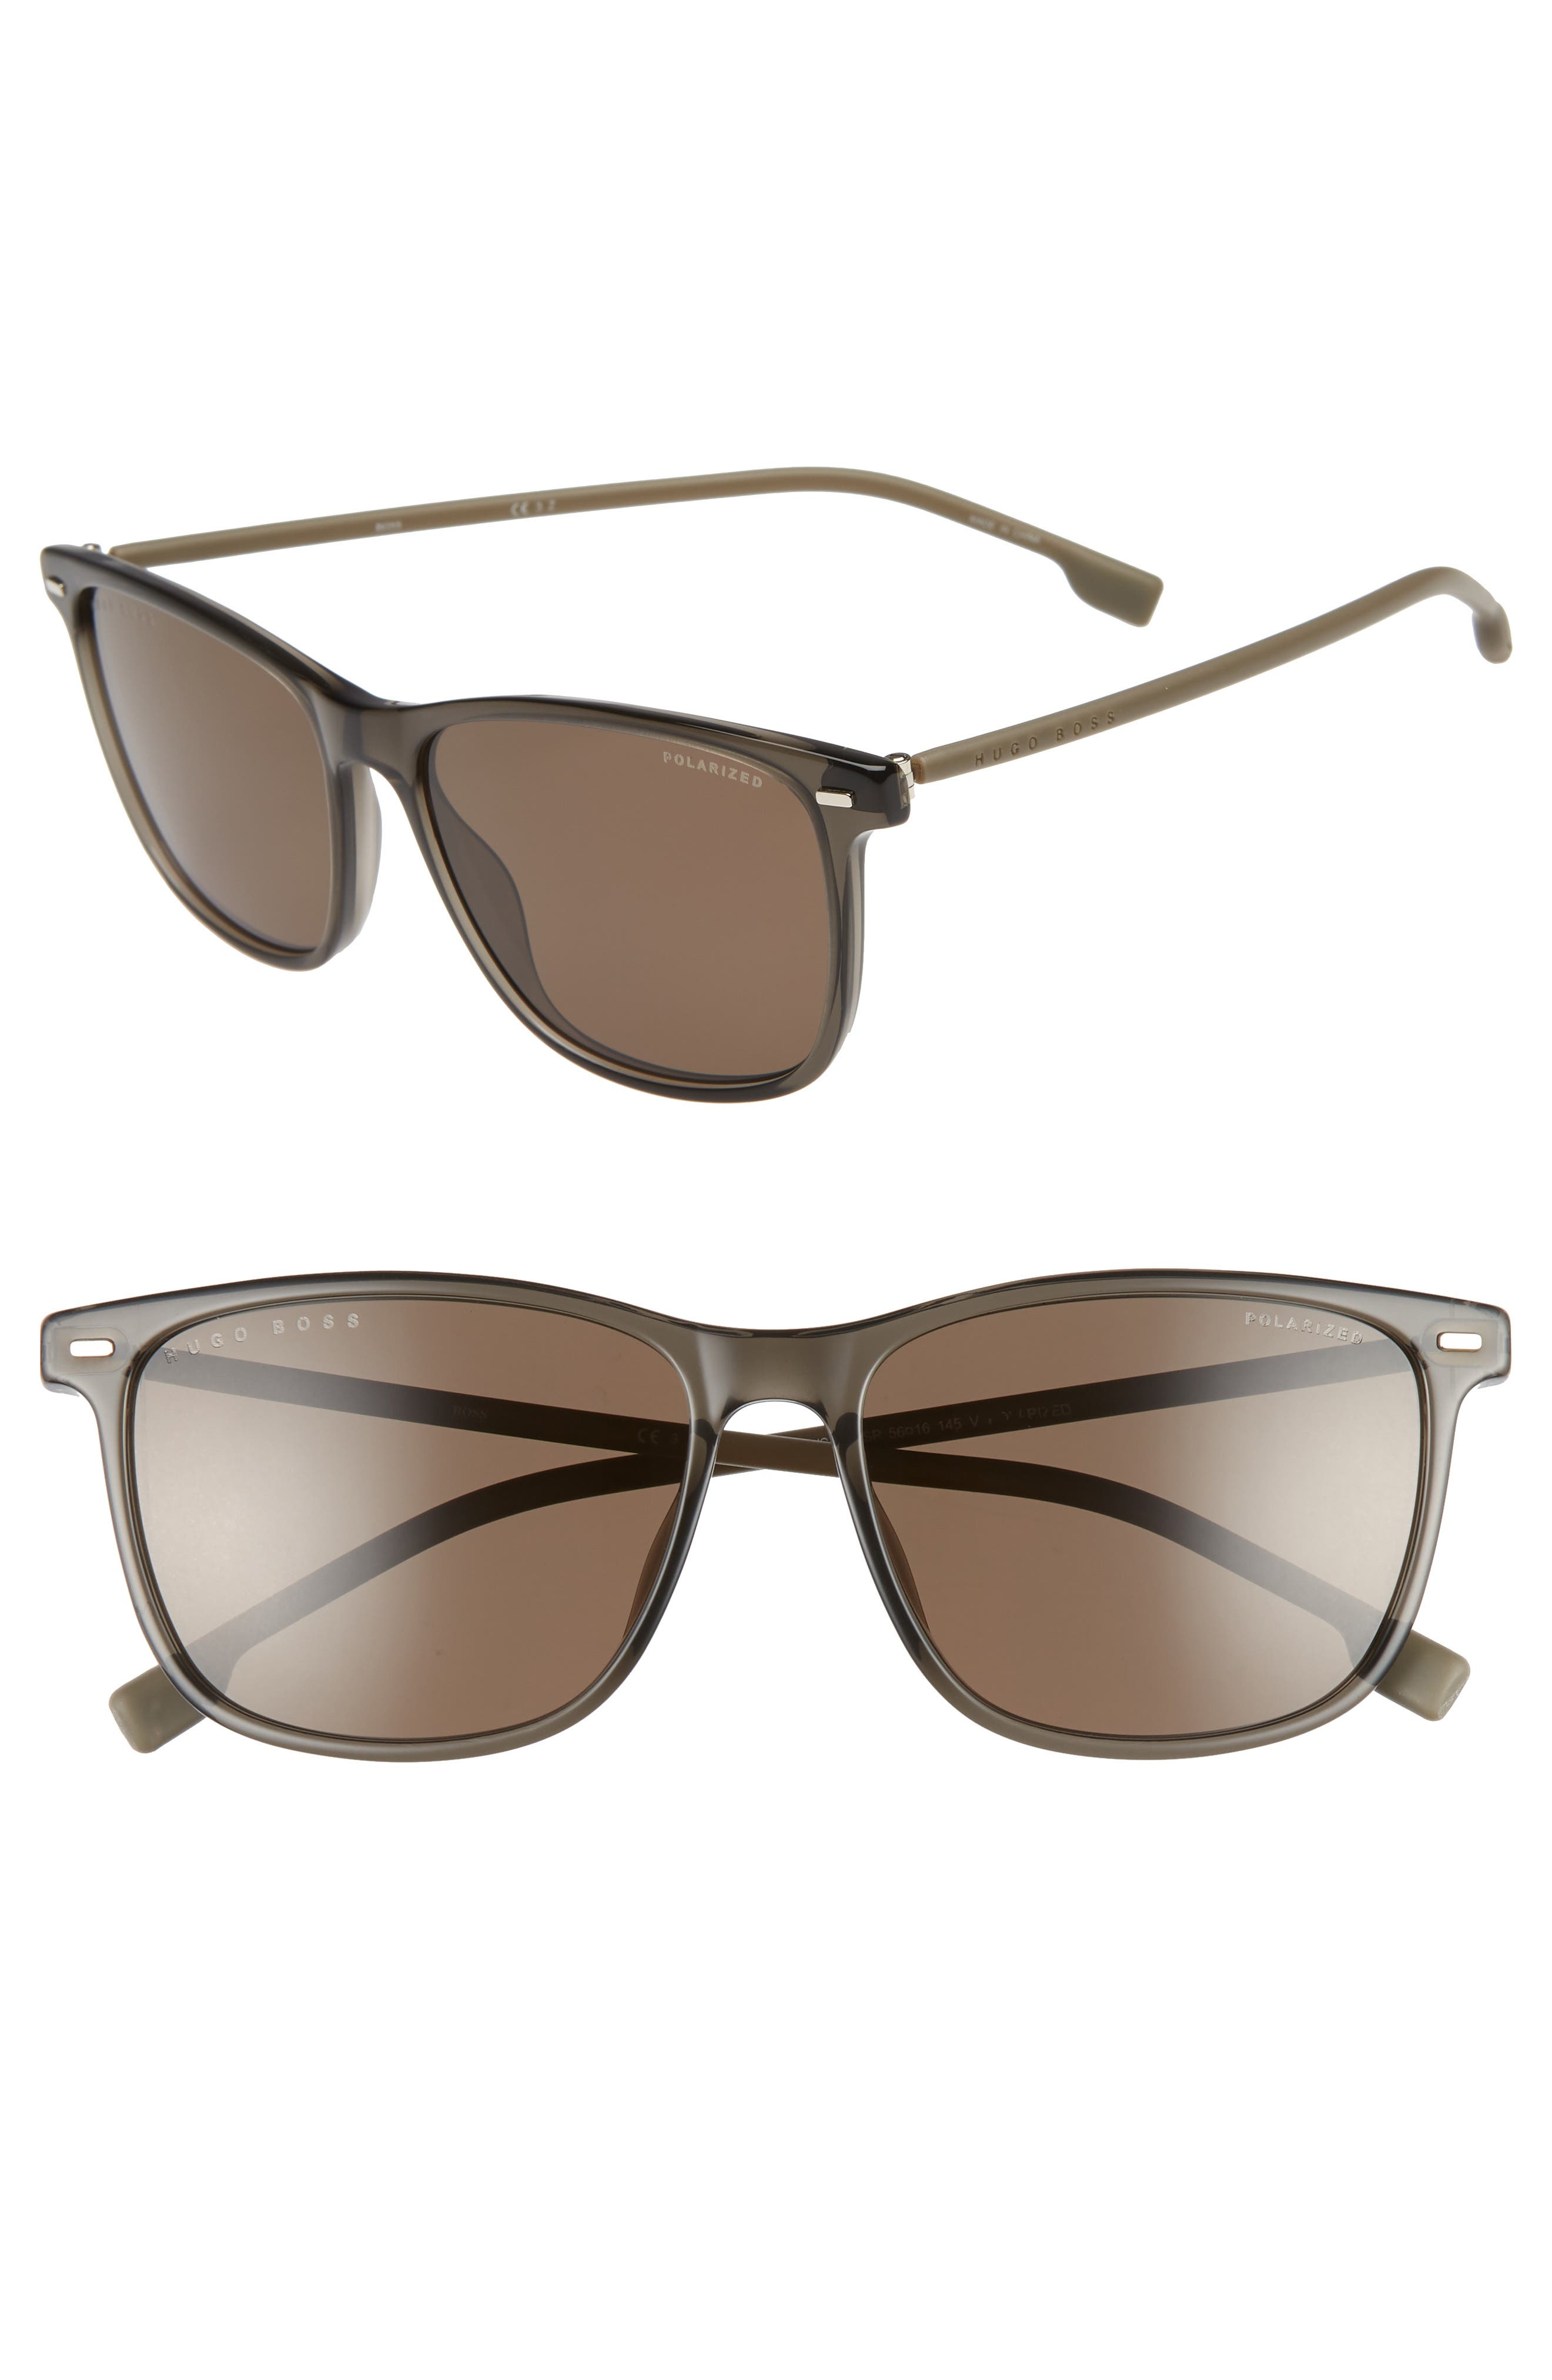 56mm Polarized Sunglasses,                             Main thumbnail 1, color,                             GREY BEIGE